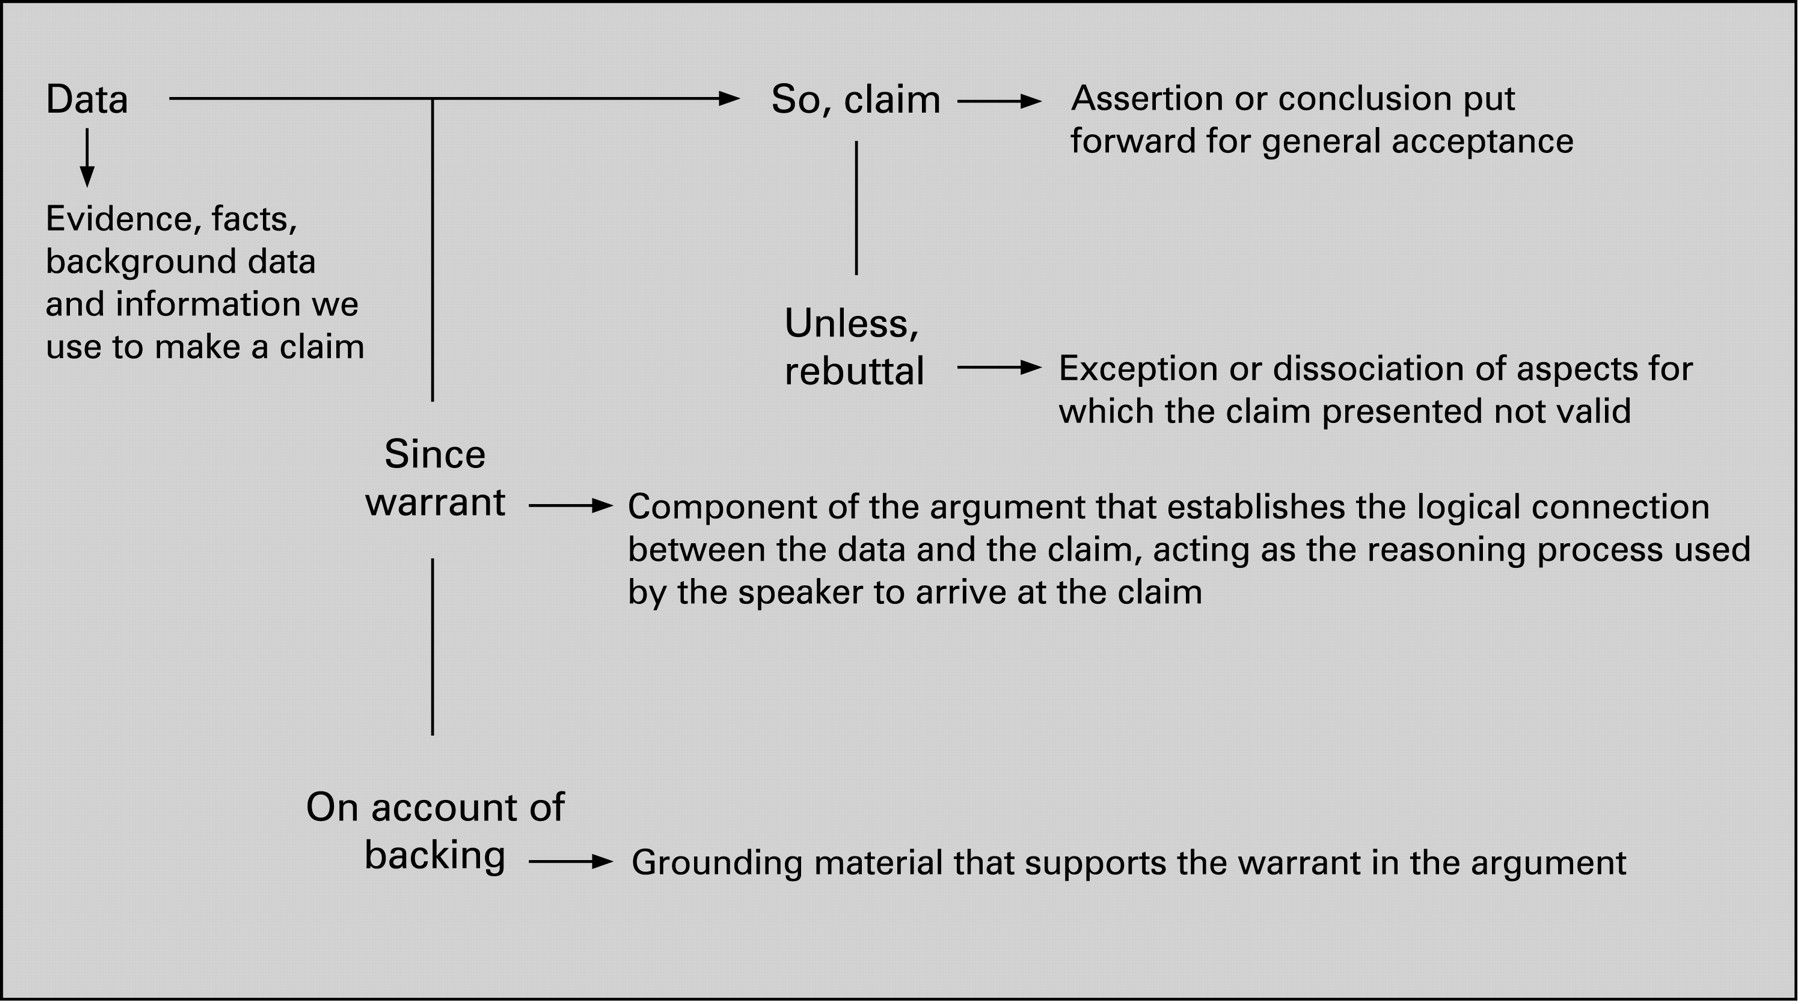 term papers qualitative and quantitative research r ticism in term papers qualitative and quantitative research r ticism in english literature essays pov in dbq essay